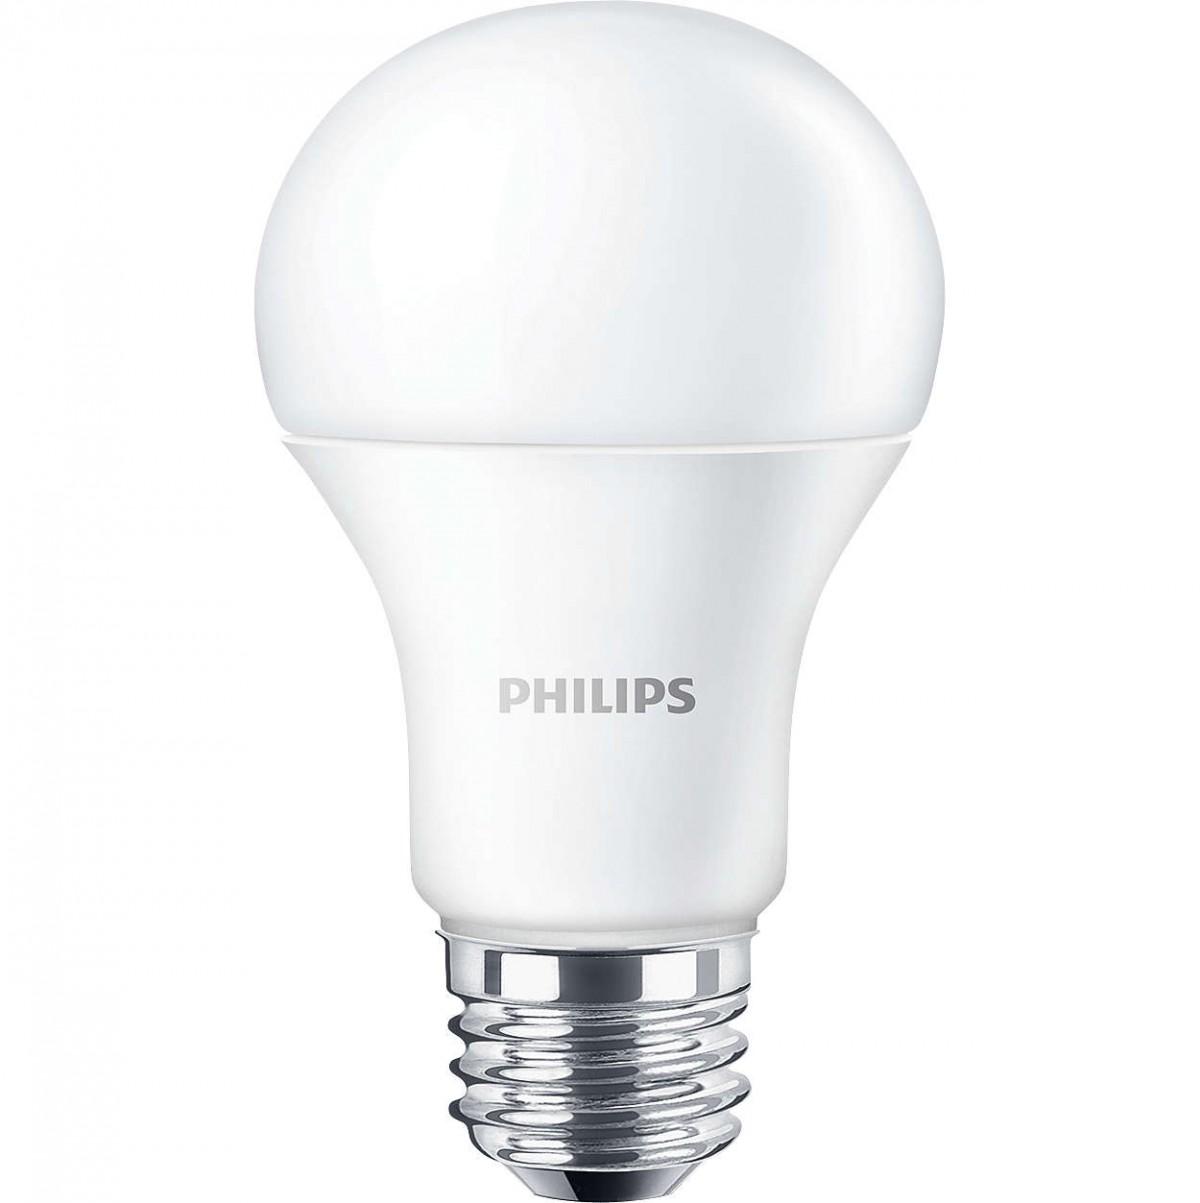 LED žárovka úsporná Philips 9,5W -> ekvivalent 60W E27 - CorePro LEDbulb D 9.5-60W E27 827